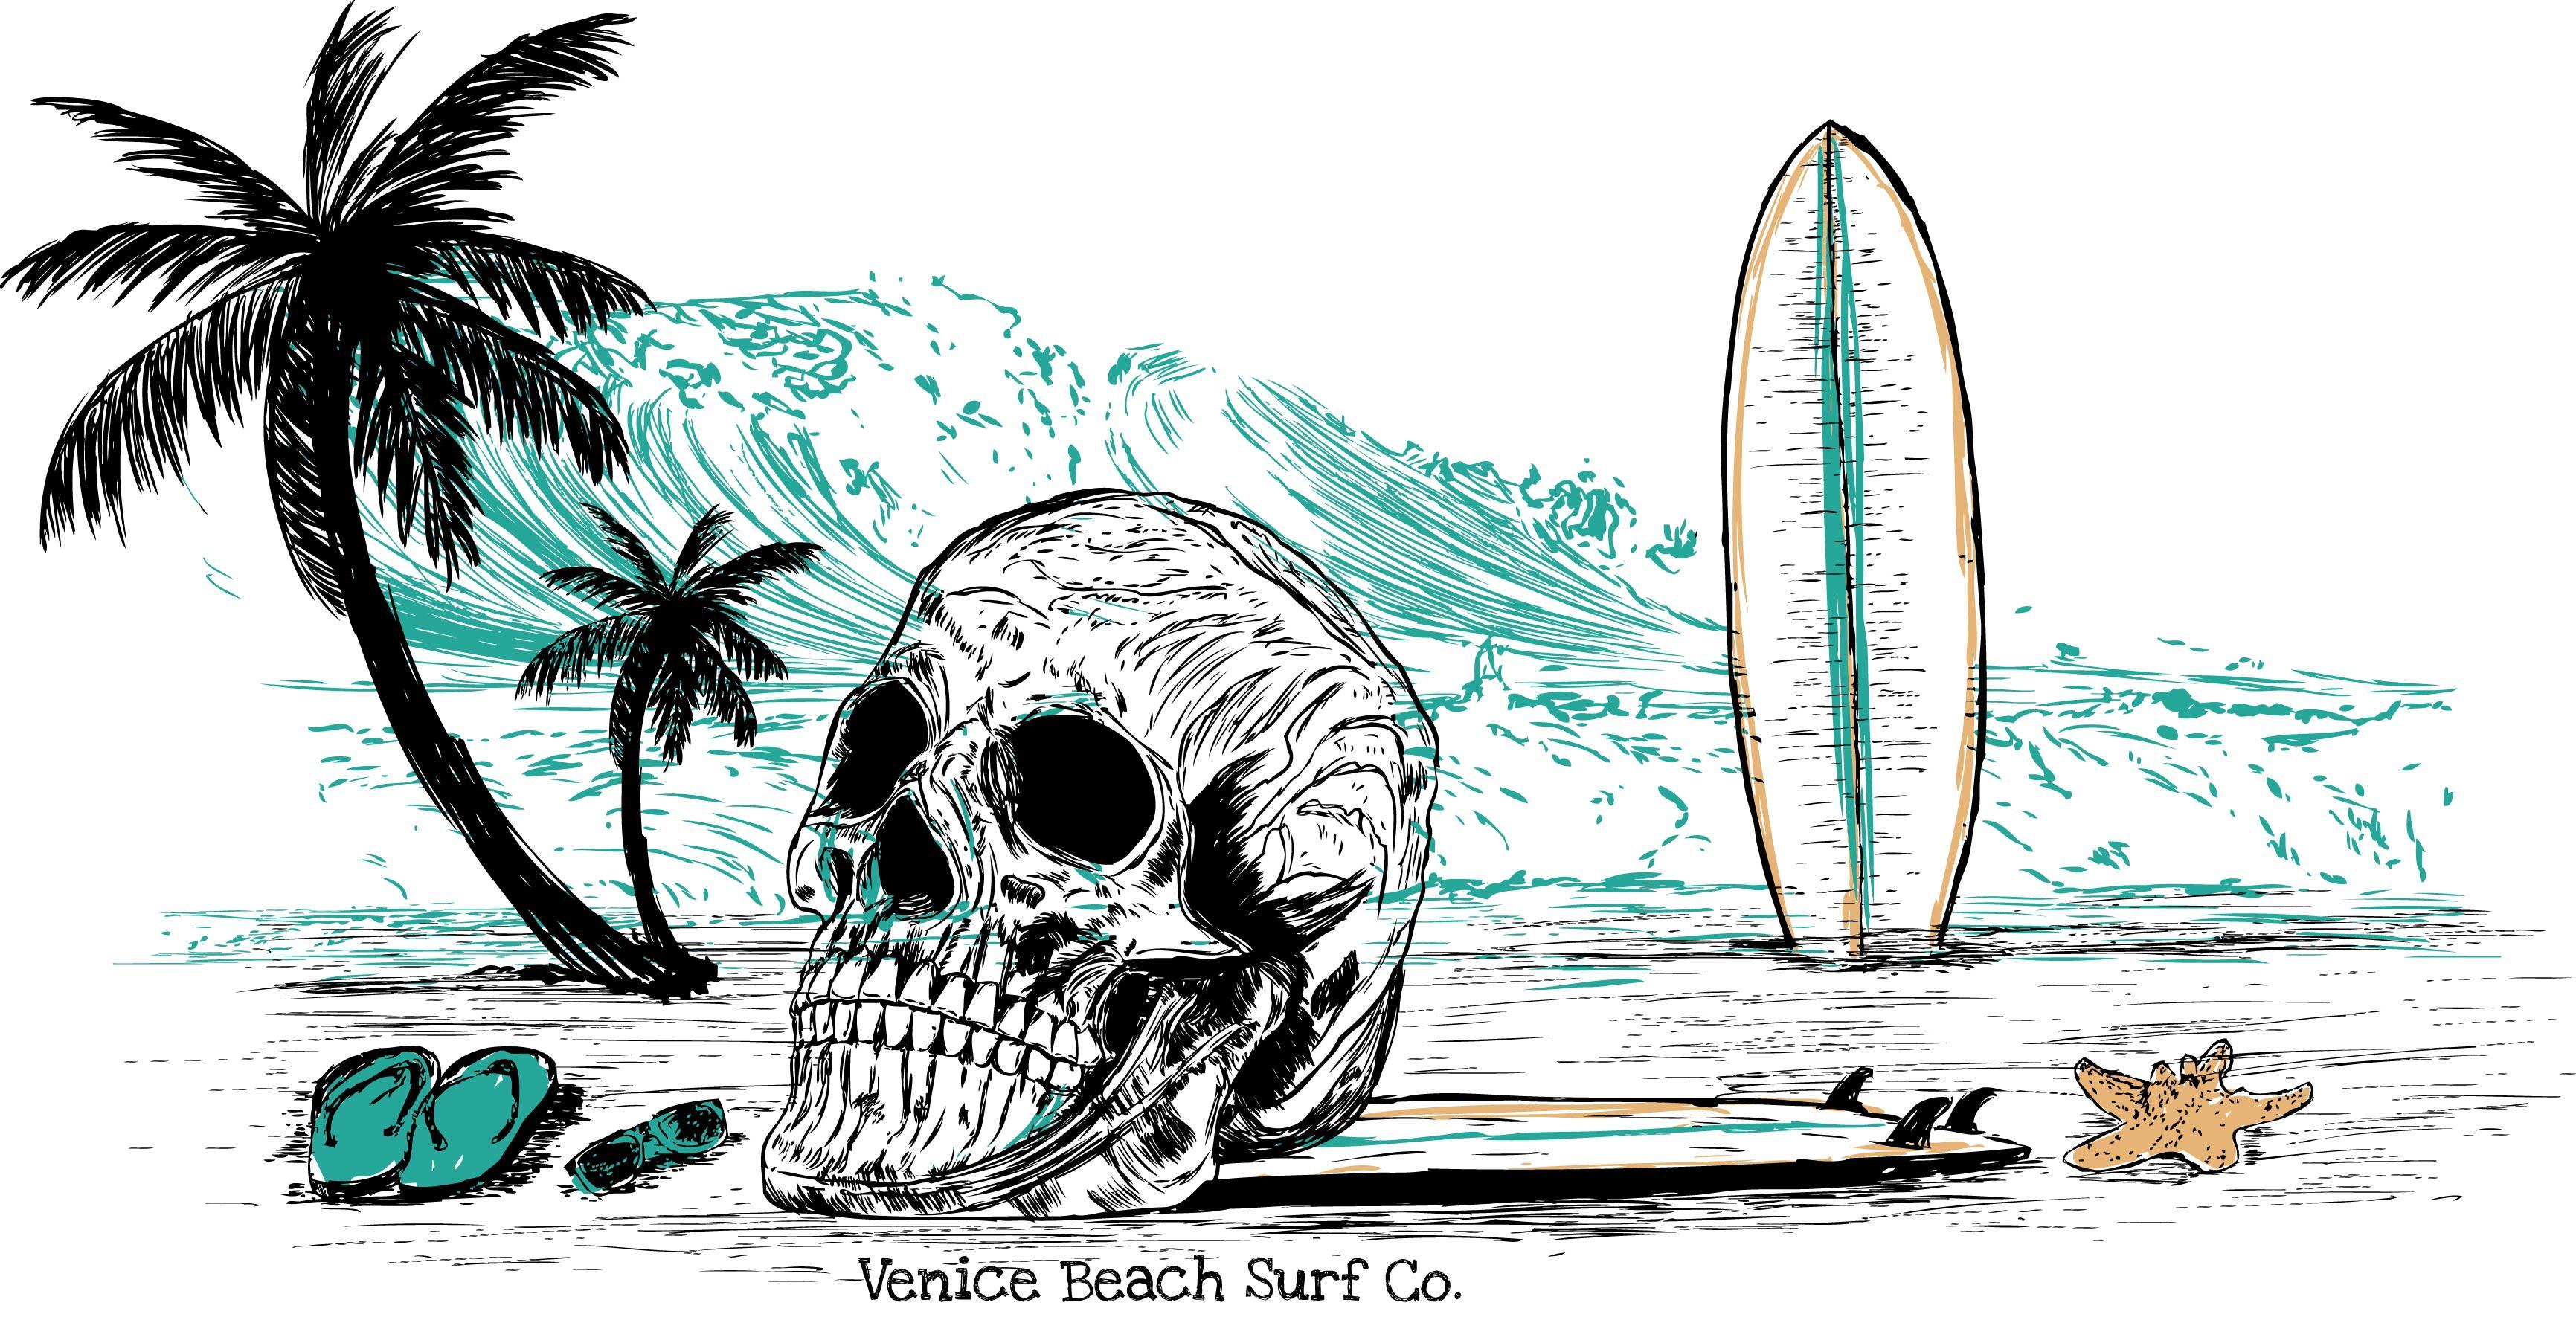 Edgy Venice Surfshop needs designs